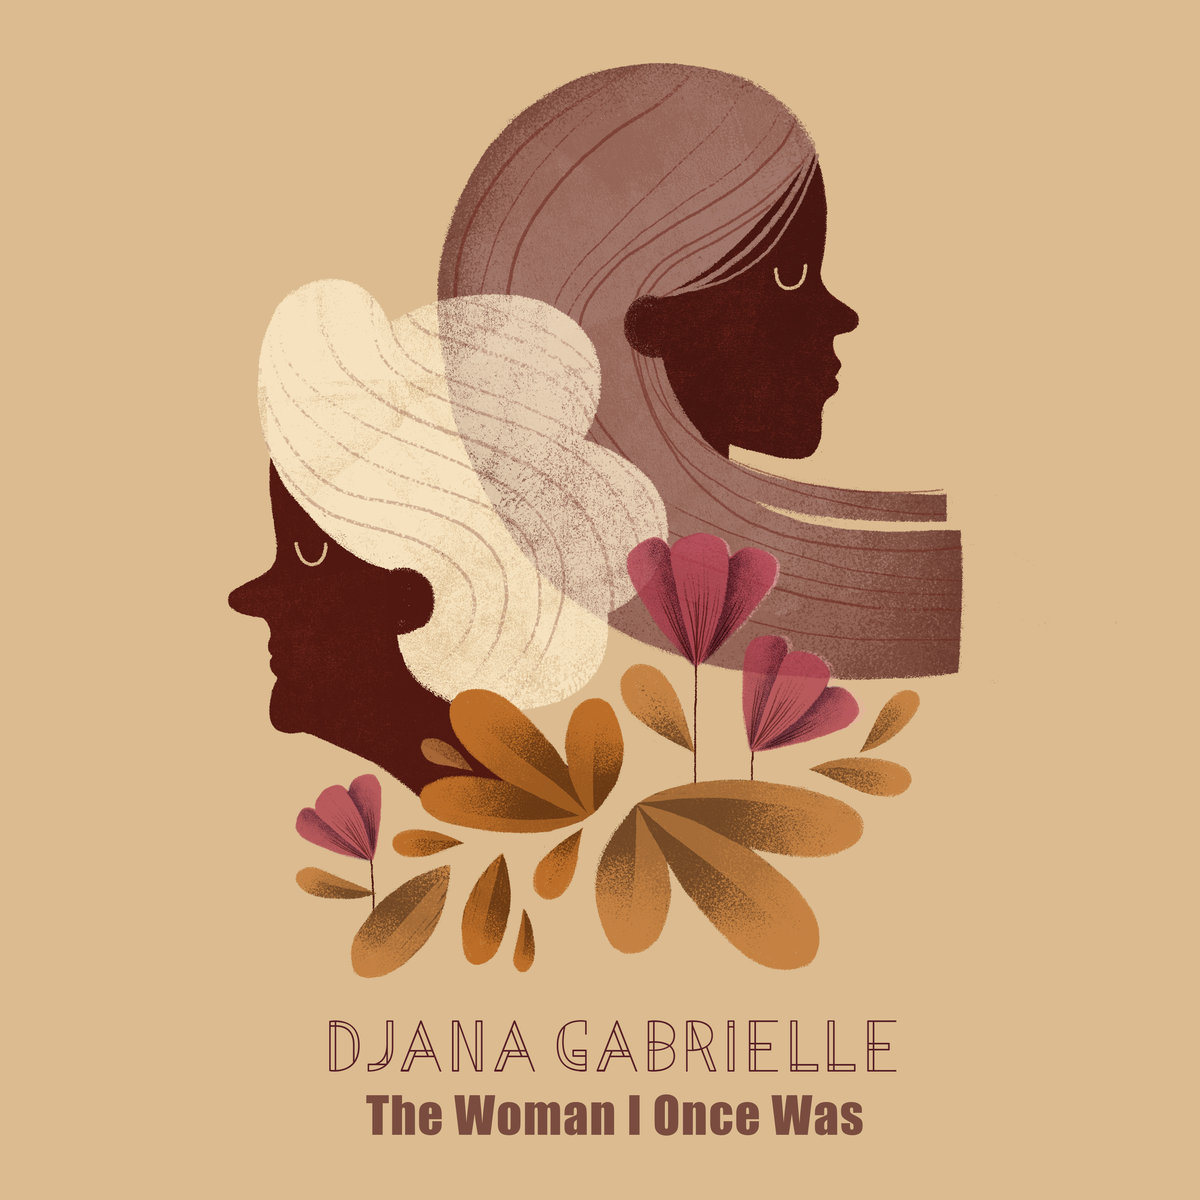 Djana Gabrielle 'The Woman I once Was' Artwork